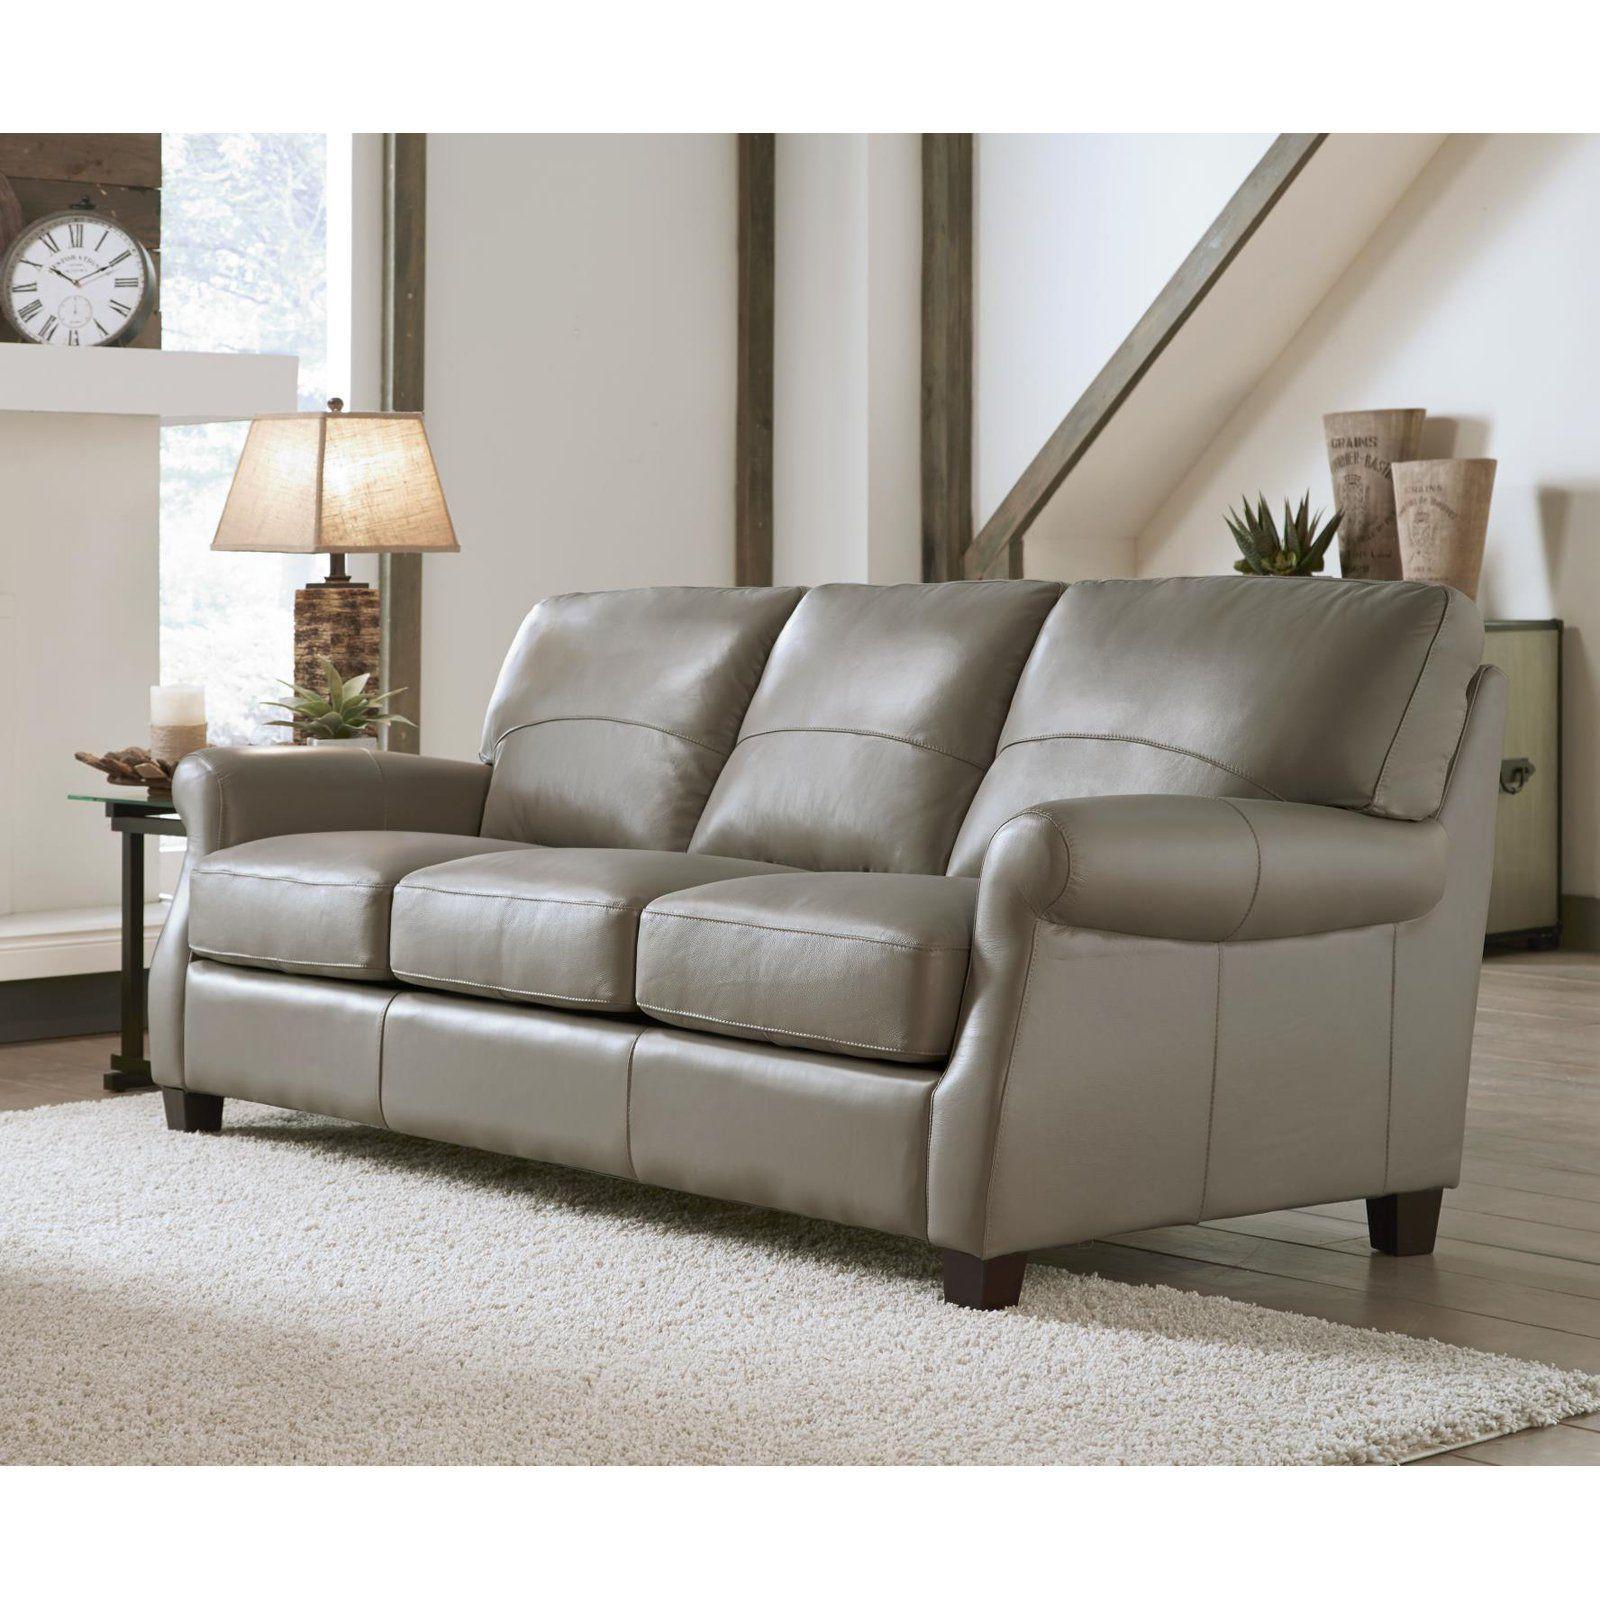 Lazzaro Leather Carlyle Adobe Sofa - WH-2022-30-3372 ...